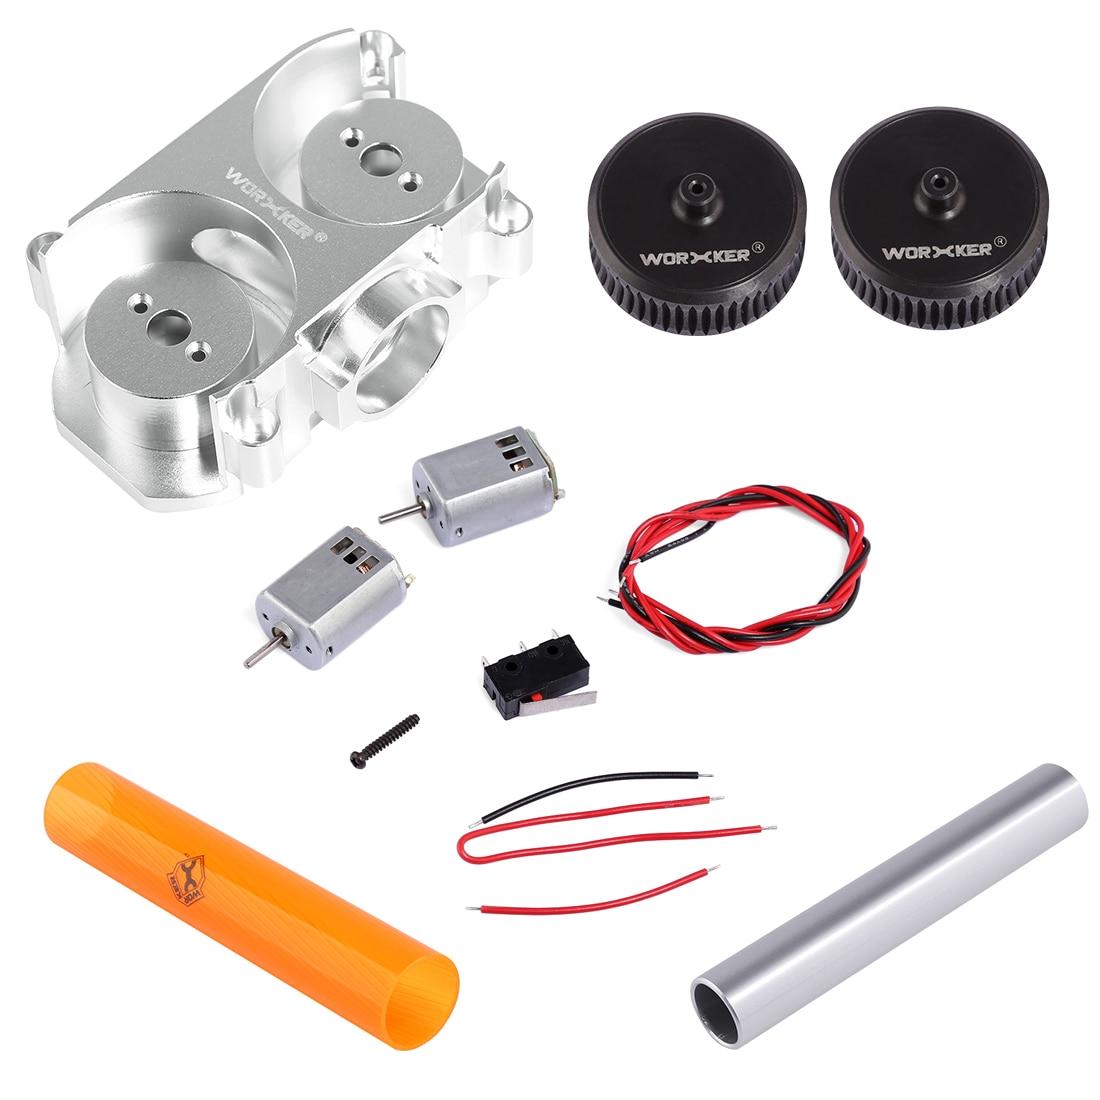 TRABALHADOR ABS Modificado Volante Roda de Nervura Reta + Tubo De Rosca De Plástico + Tubo De Alumínio + Volante Plana Gaiola + 132 Motor para NERF